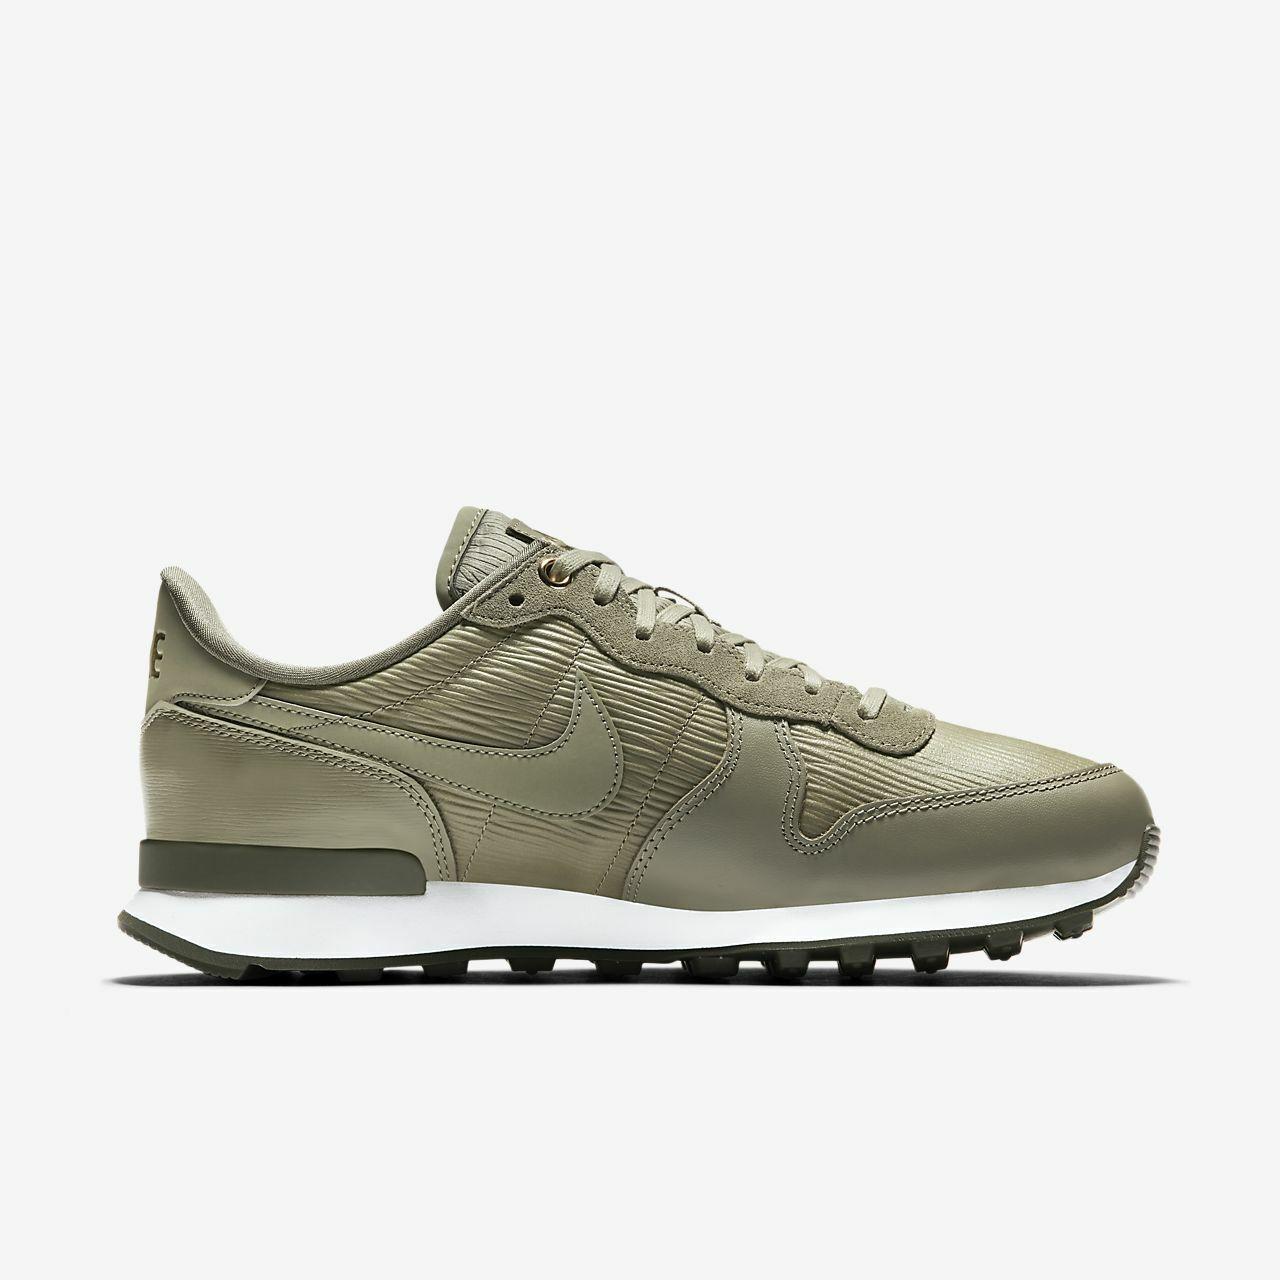 Nike Wmns Internationalist Premium 828404-203 Size 7.5 UK